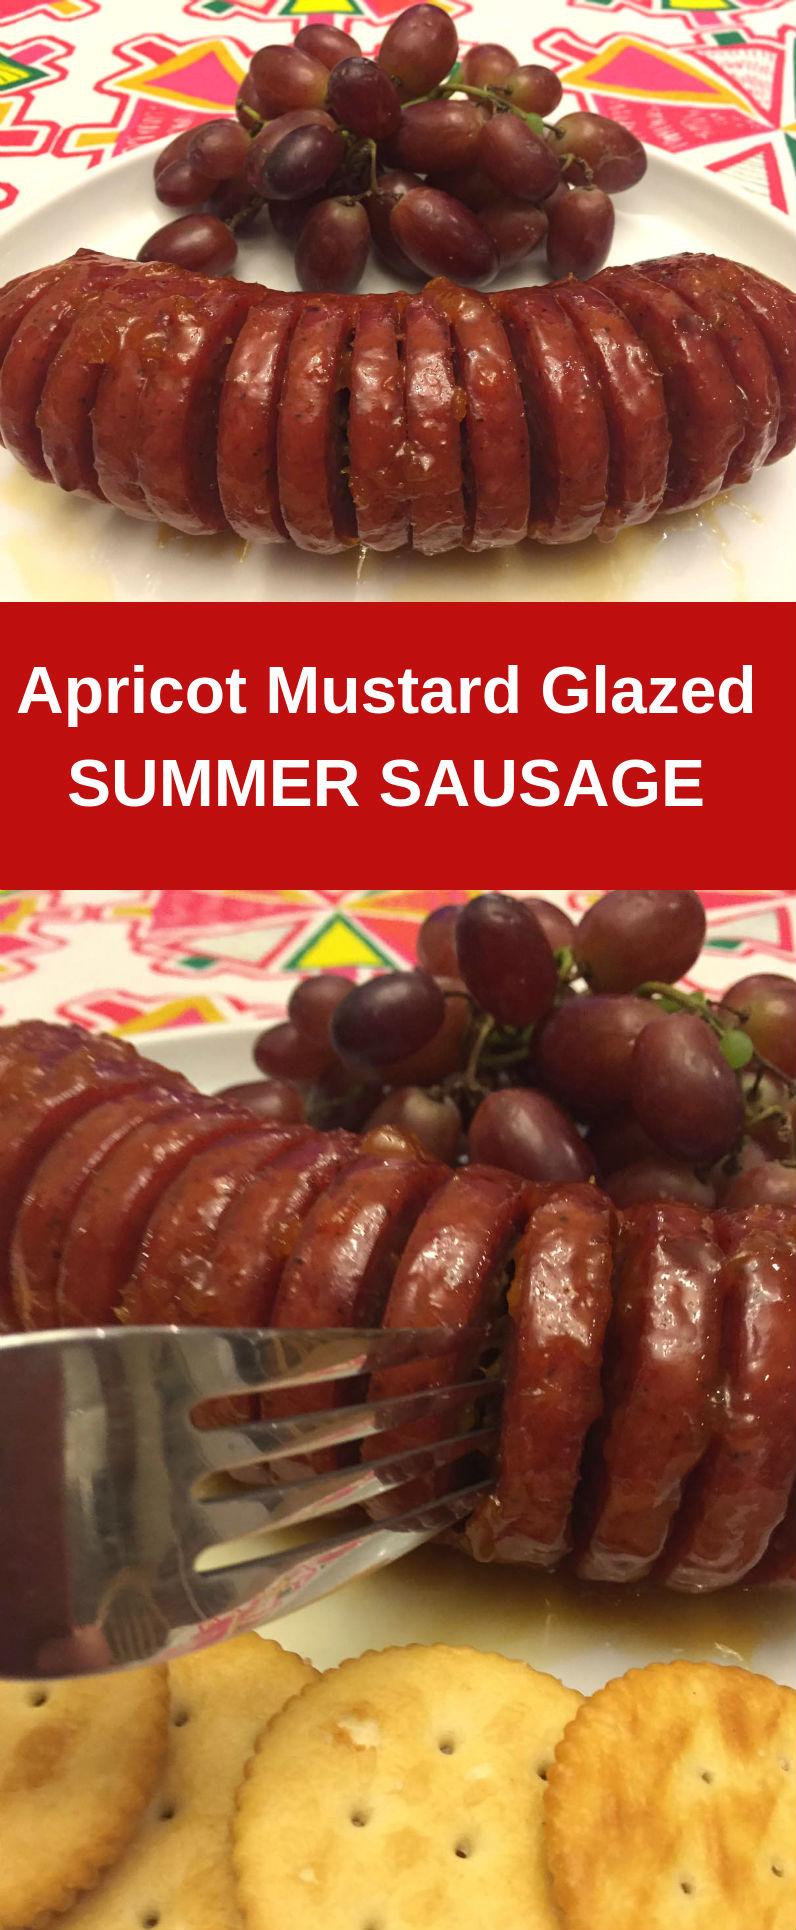 Apricot-Mustard Glazed Summer Sausage - so finger-lickin' good!